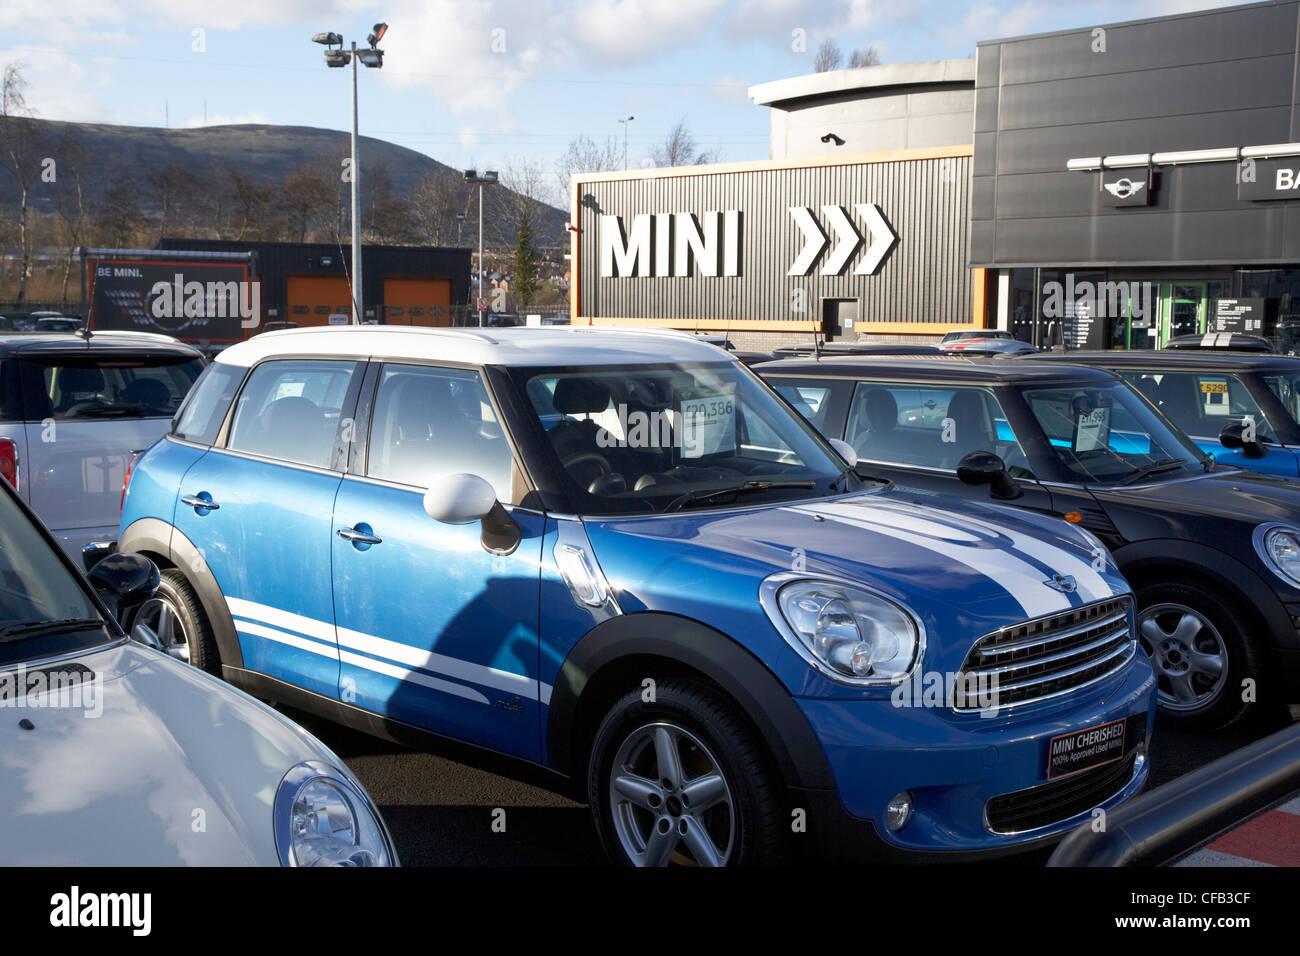 Mini Car Sales Birmingham Uk